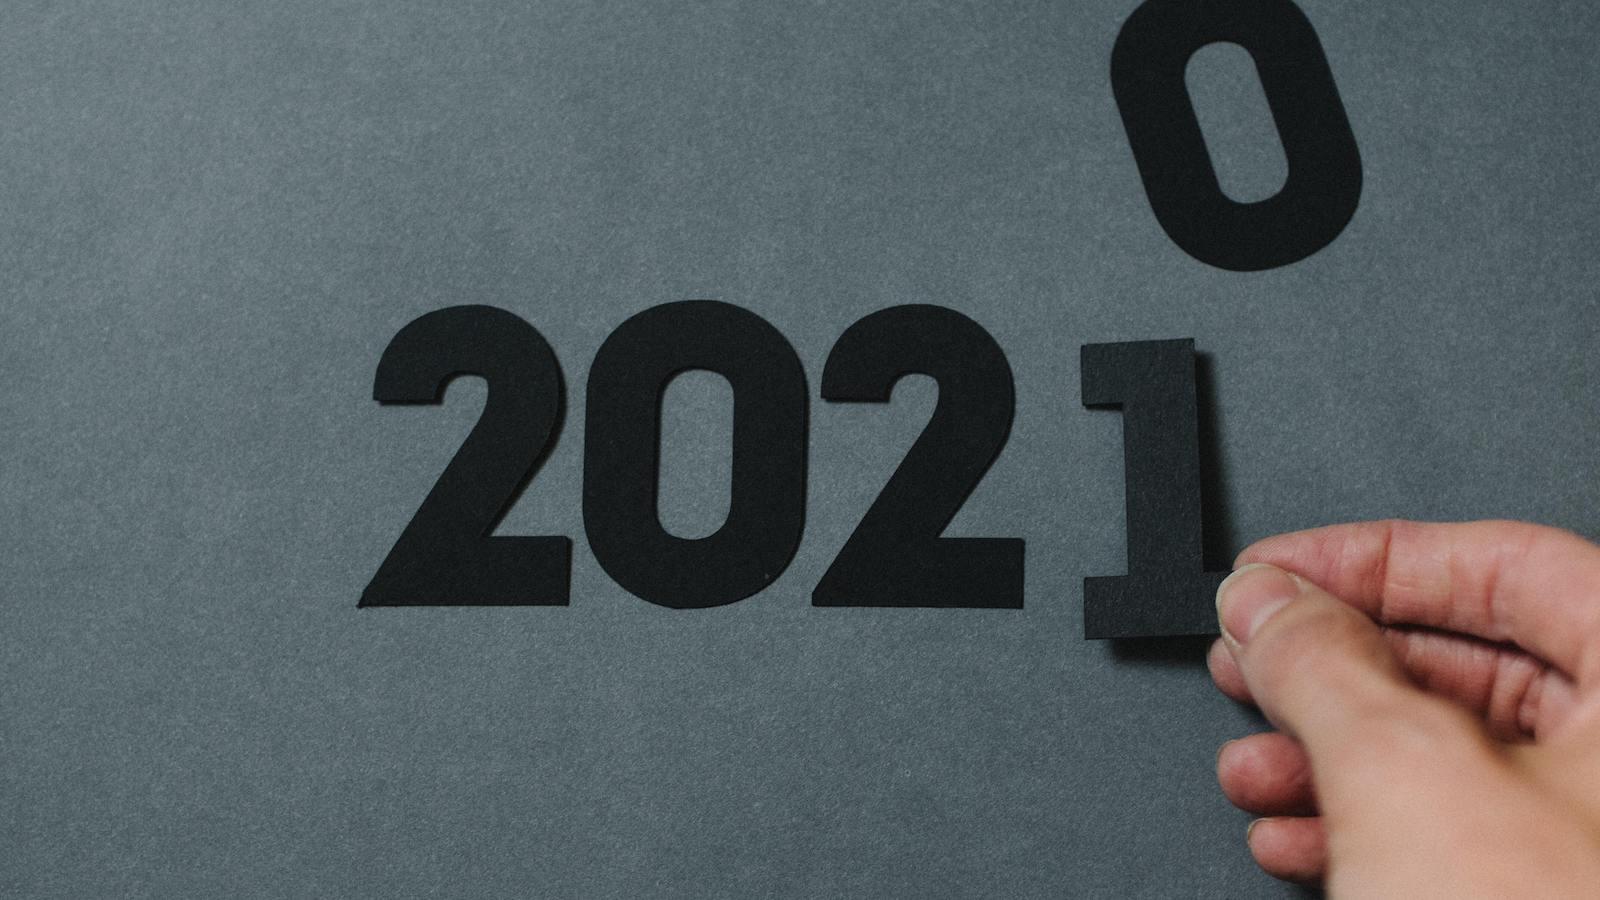 Calendar flipping to 2021